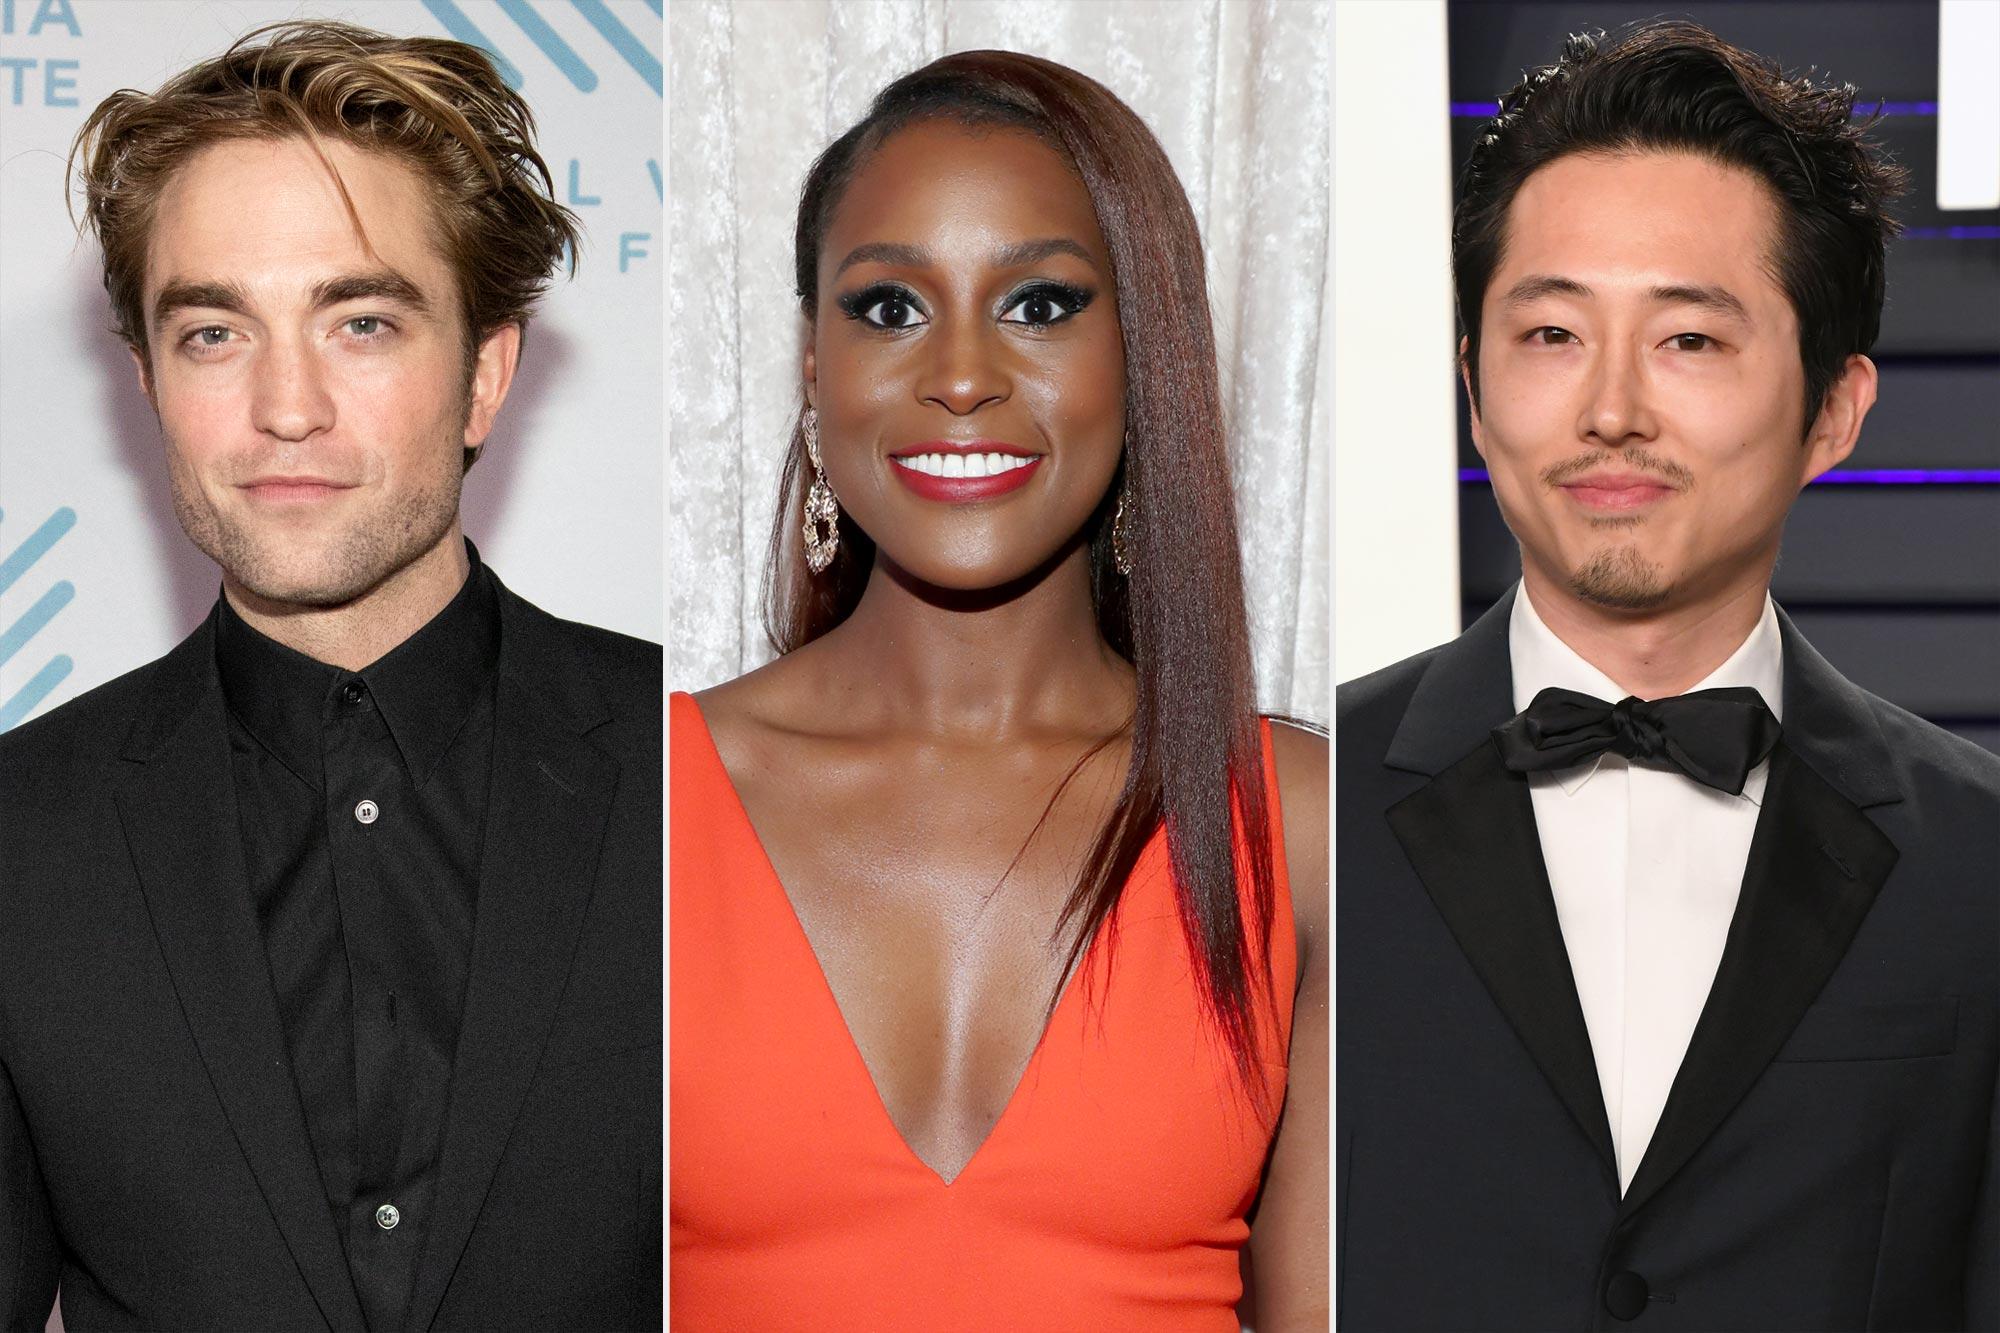 Robert Pattinson, Issa Rae, and Steven Yeun